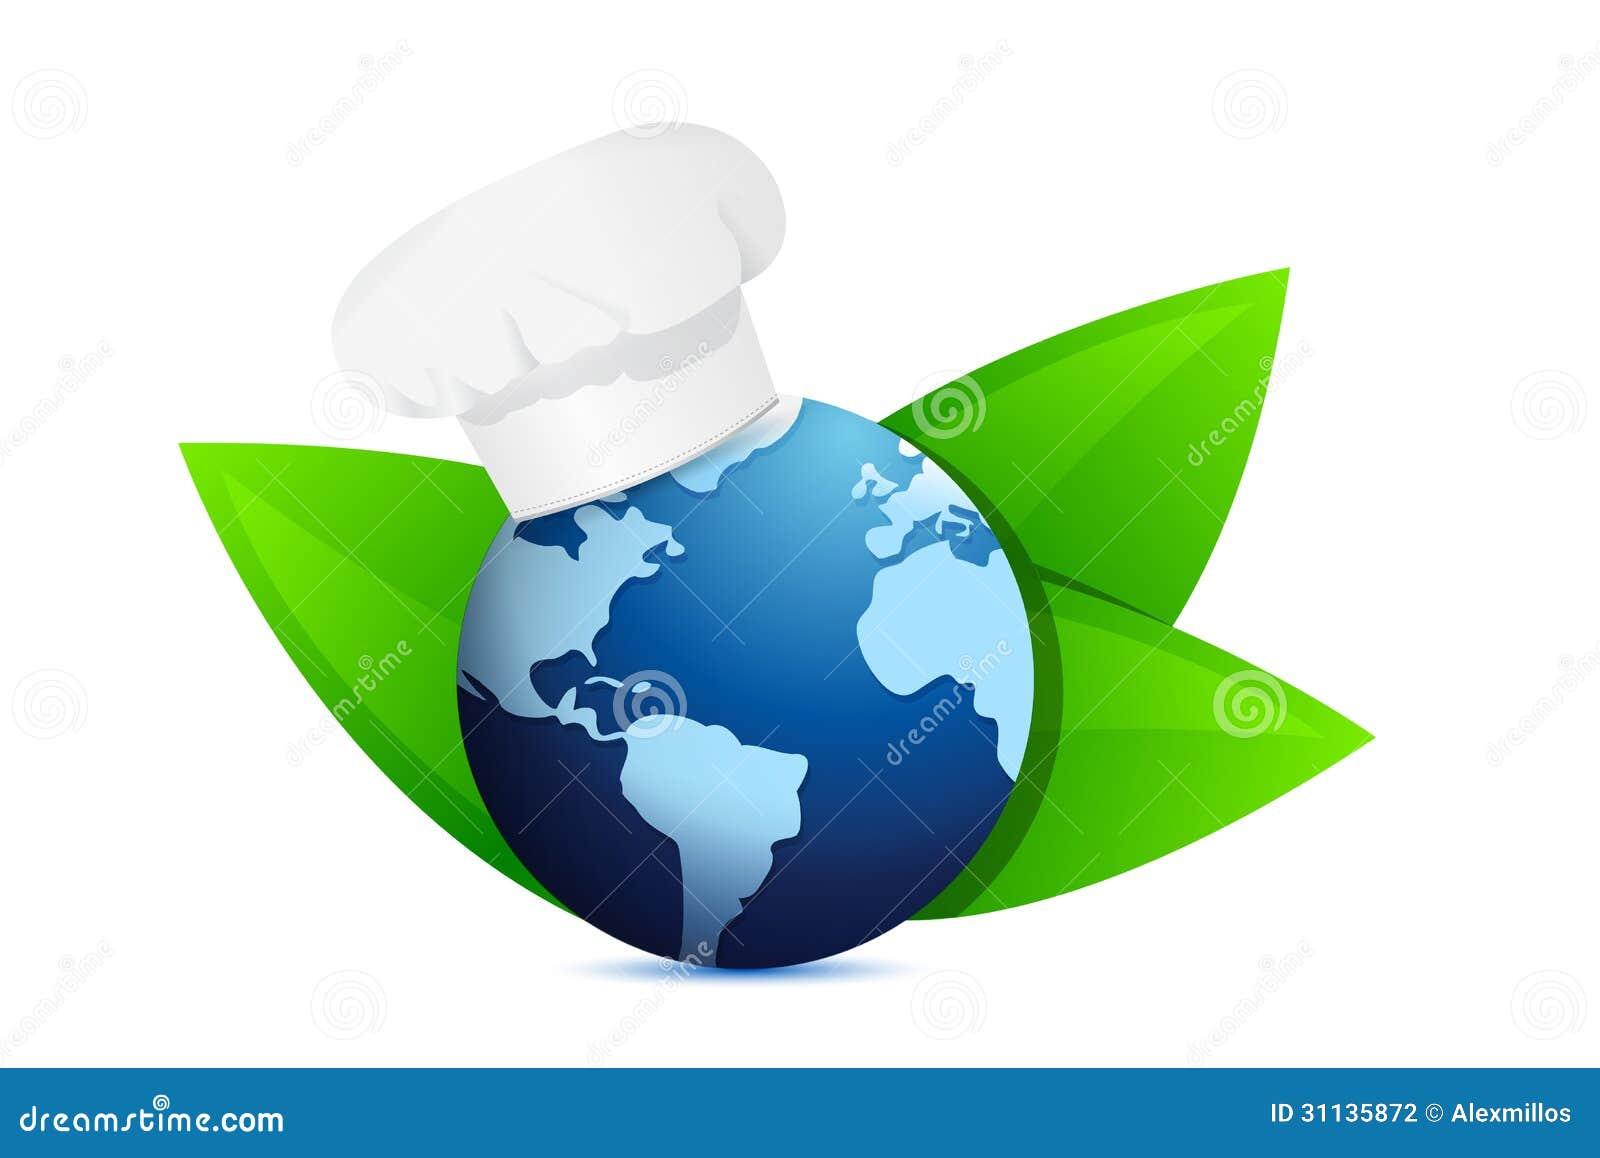 chef hat and eco globe international cuisine stock. Black Bedroom Furniture Sets. Home Design Ideas